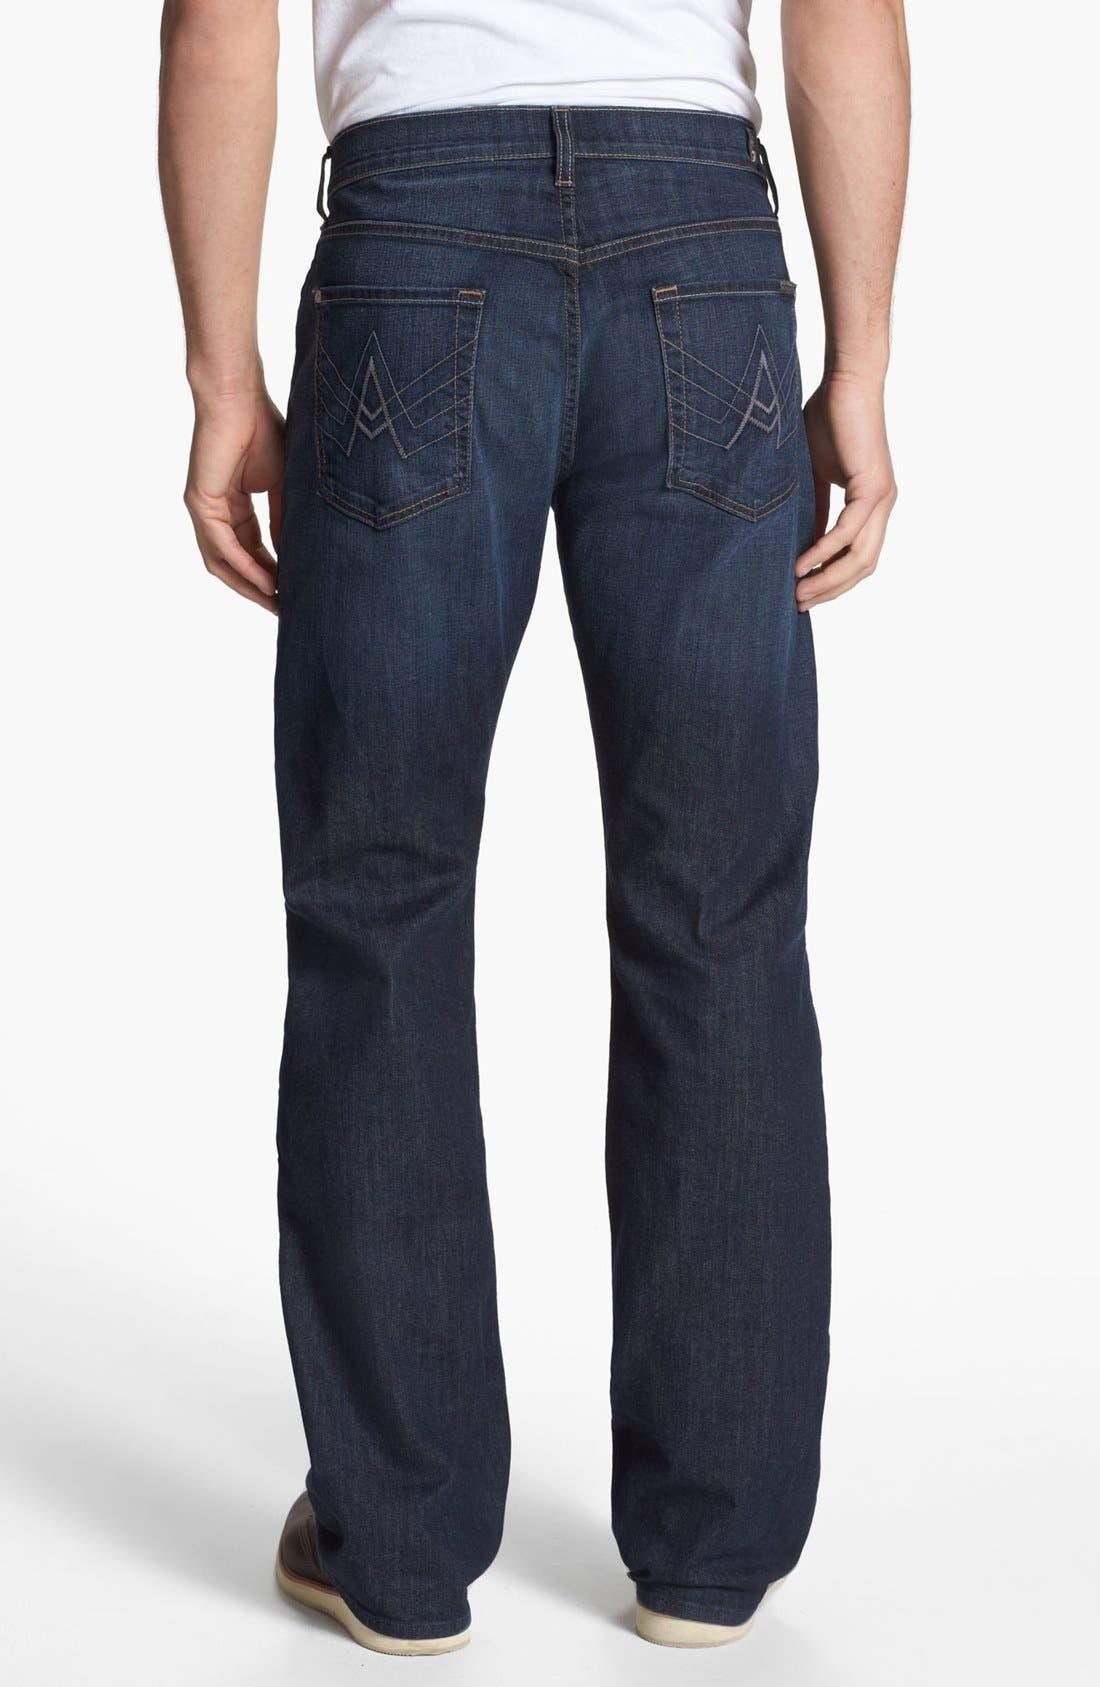 Alternate Image 1 Selected - 7 For All Mankind® 'Brett' Bootcut Jeans (Worn Hawthorne)